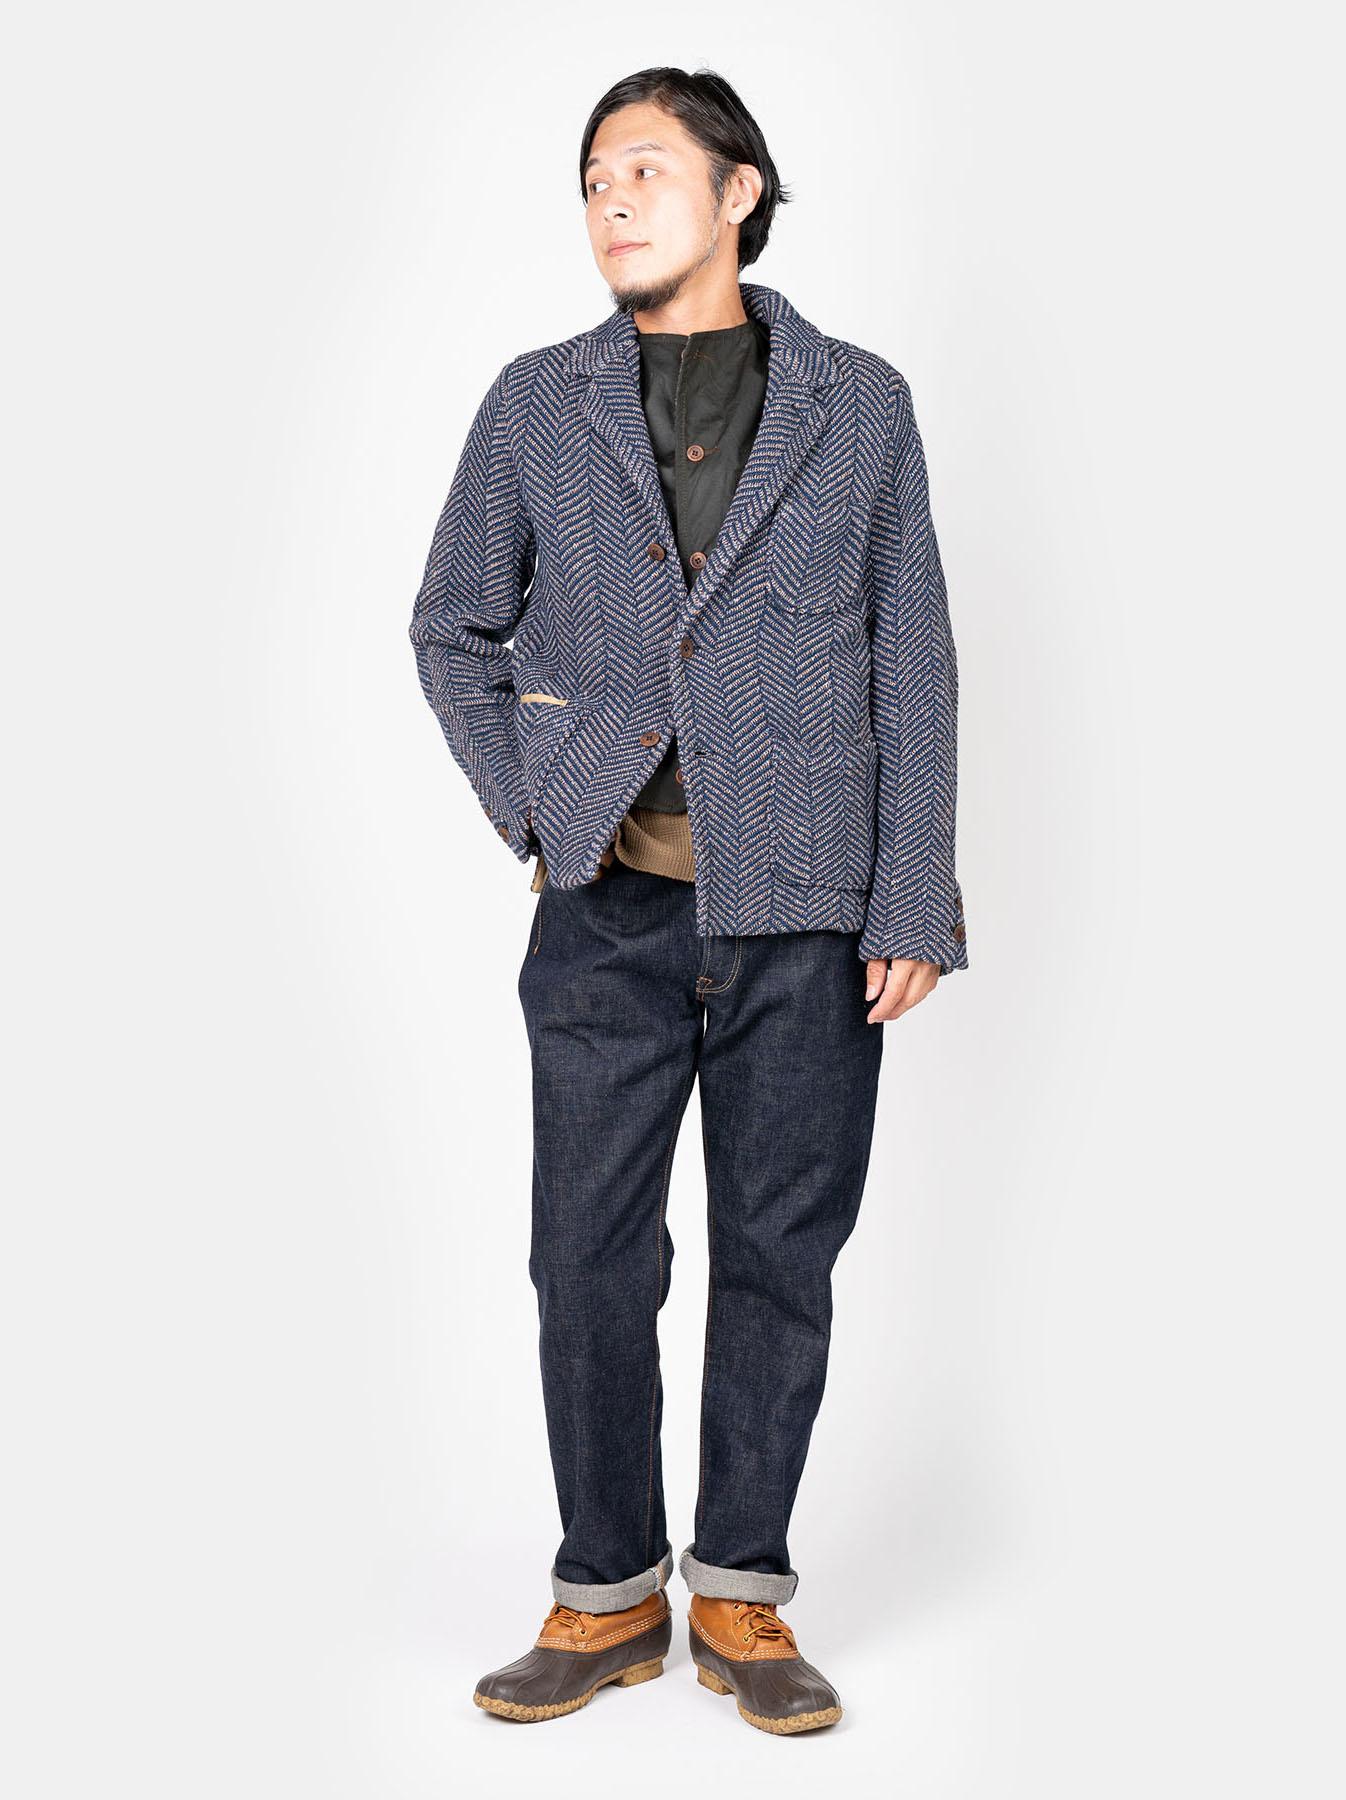 Indigo Cotton Tweed Knit Jacket-2